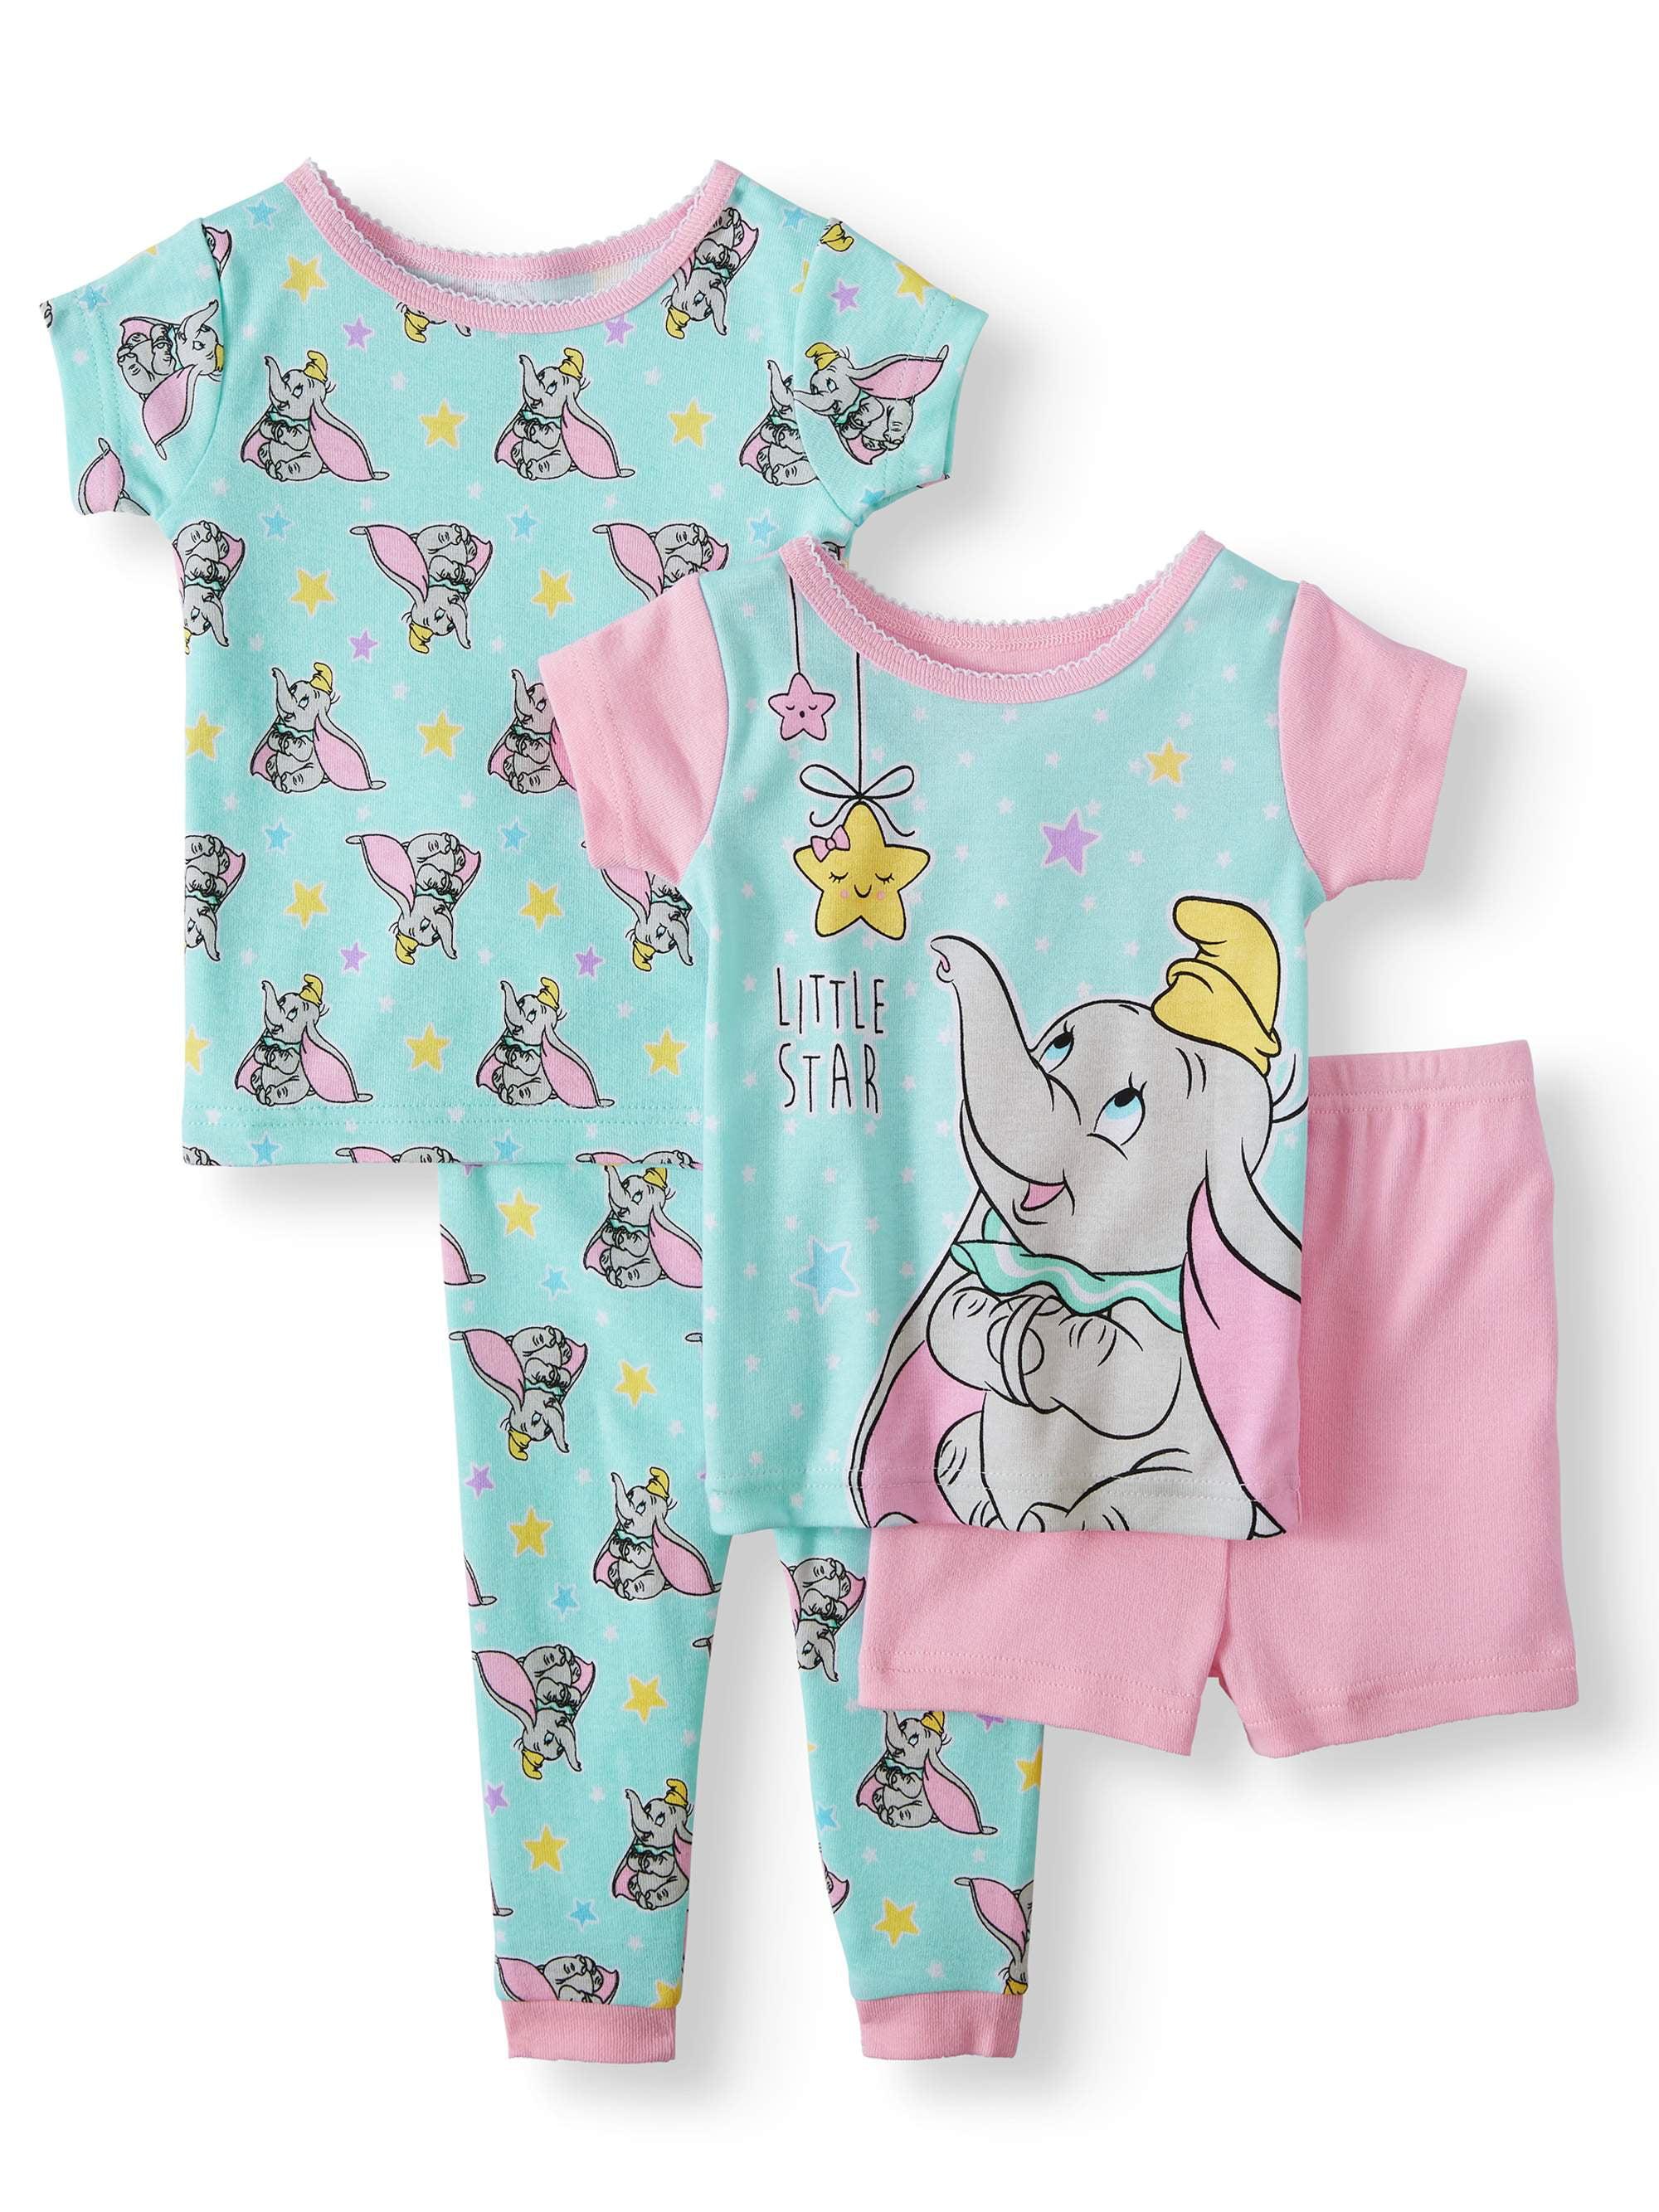 Cotton Tight Fit Pajamas, 4pc Set (Baby Girls)